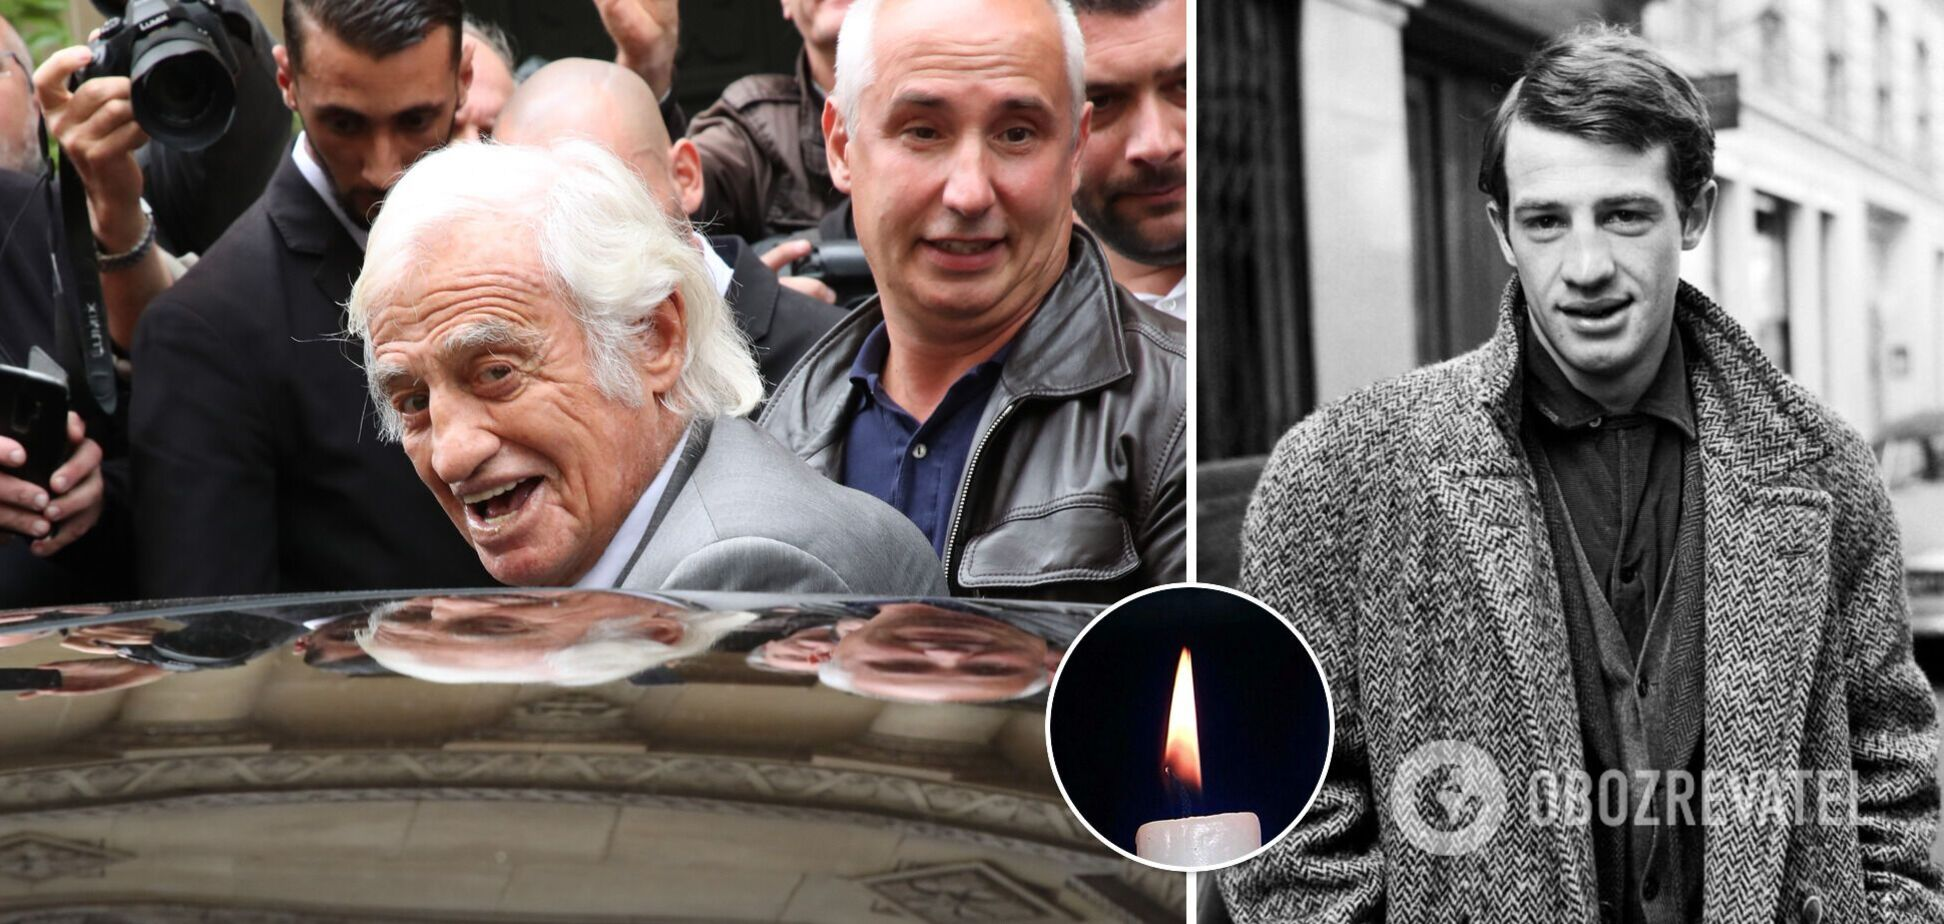 Помер легендарний французький актор Жан-Поль Бельмондо